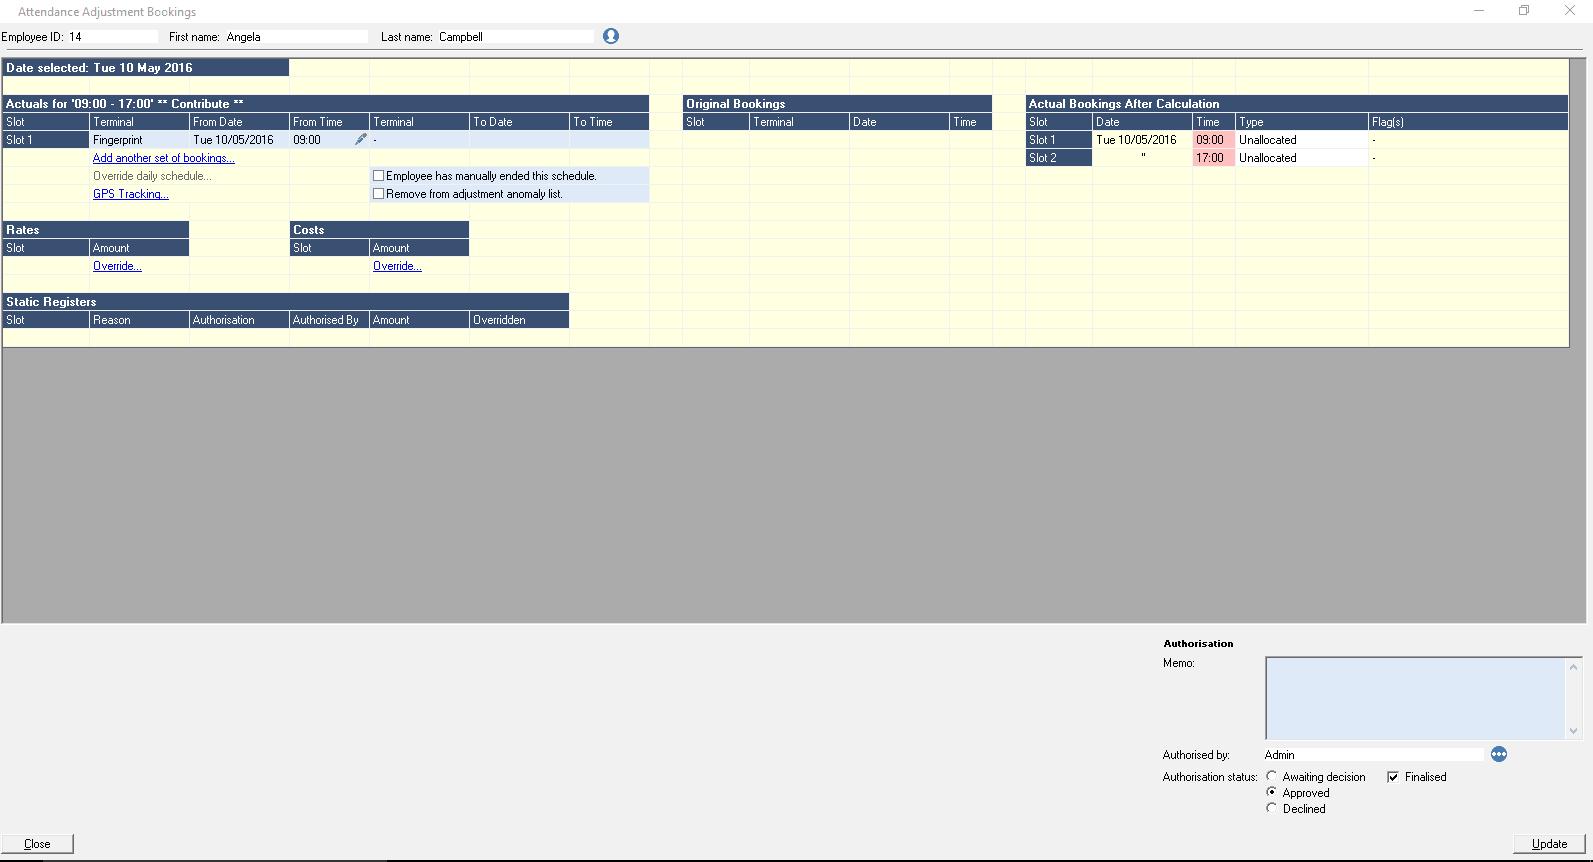 Attendance Adjustments